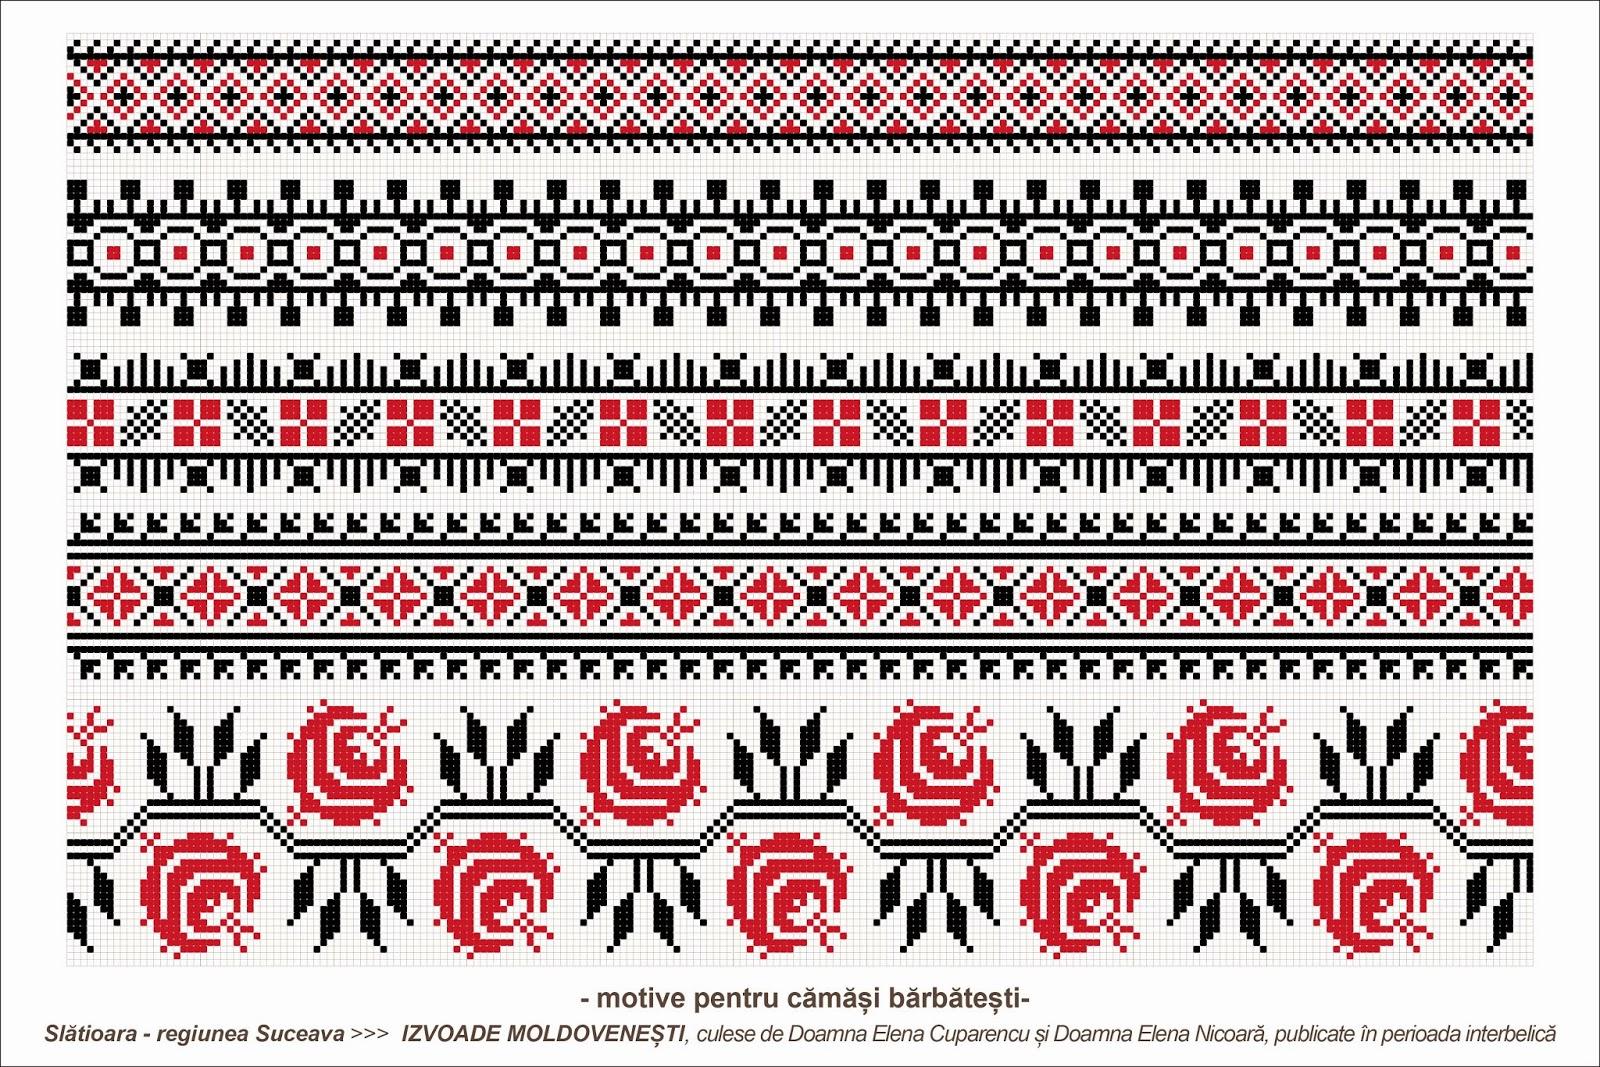 Semne Cusute Romanian Traditional Motifs Moldova Suceava Sat Slatioara